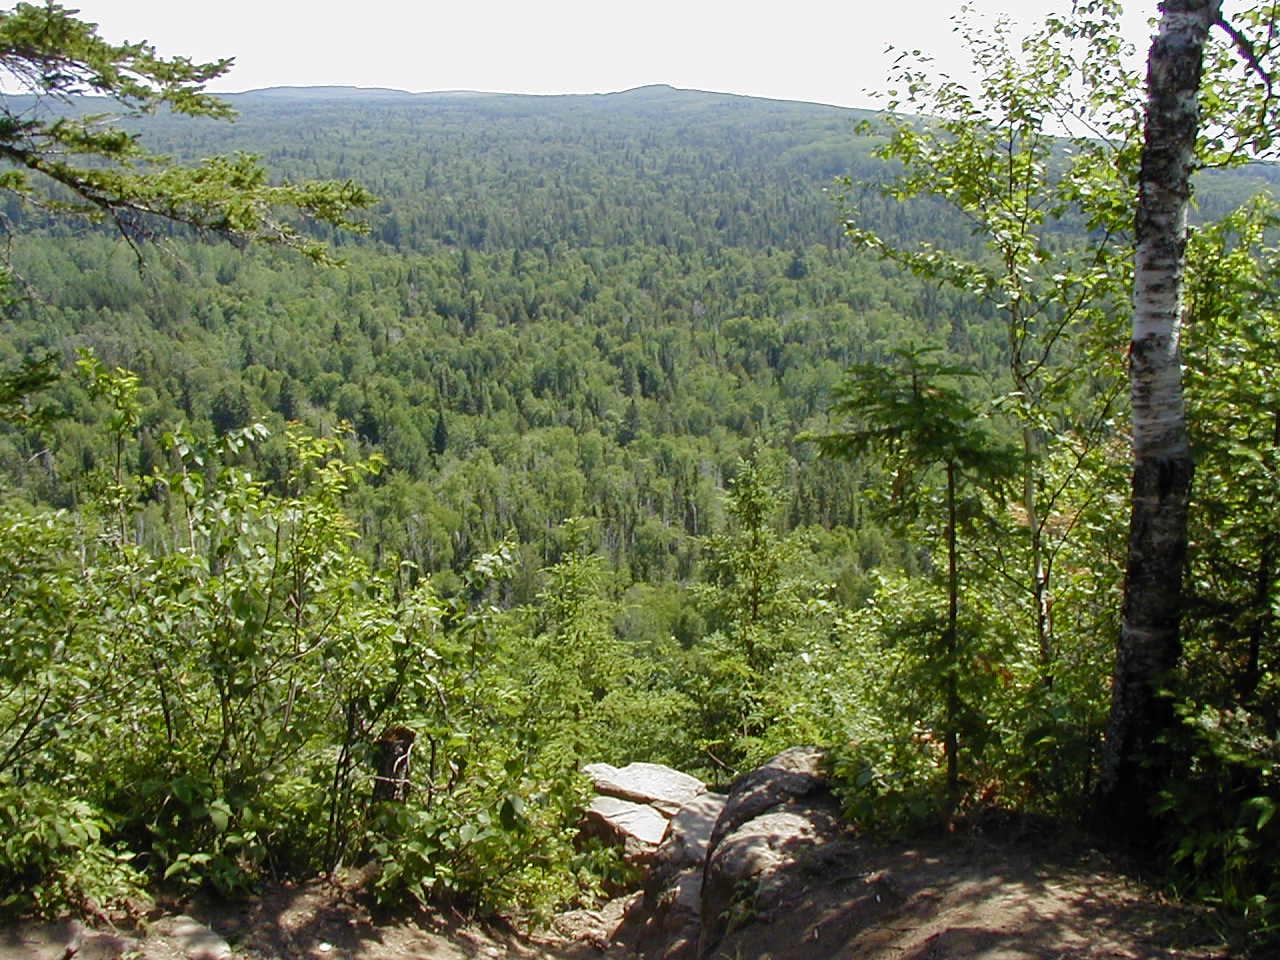 Superior Hiking Trail The Superior Hiking Trail